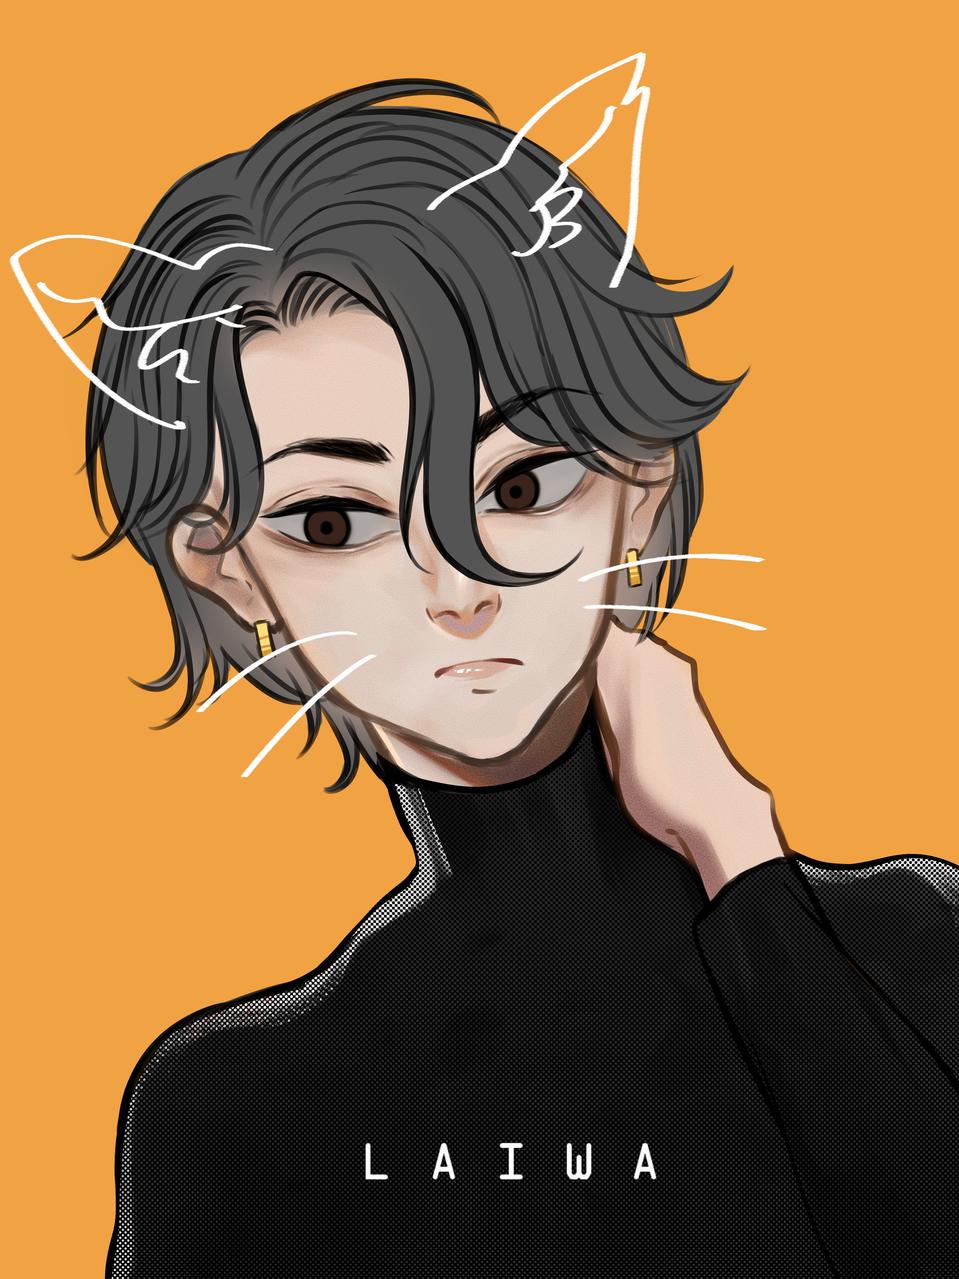 Haruko Illust of Laiwa MyIdealHusbando MyIdealWaifu_MyIdealHusbandoContest illustration cat orginalcharacter boy original drawing oc cute